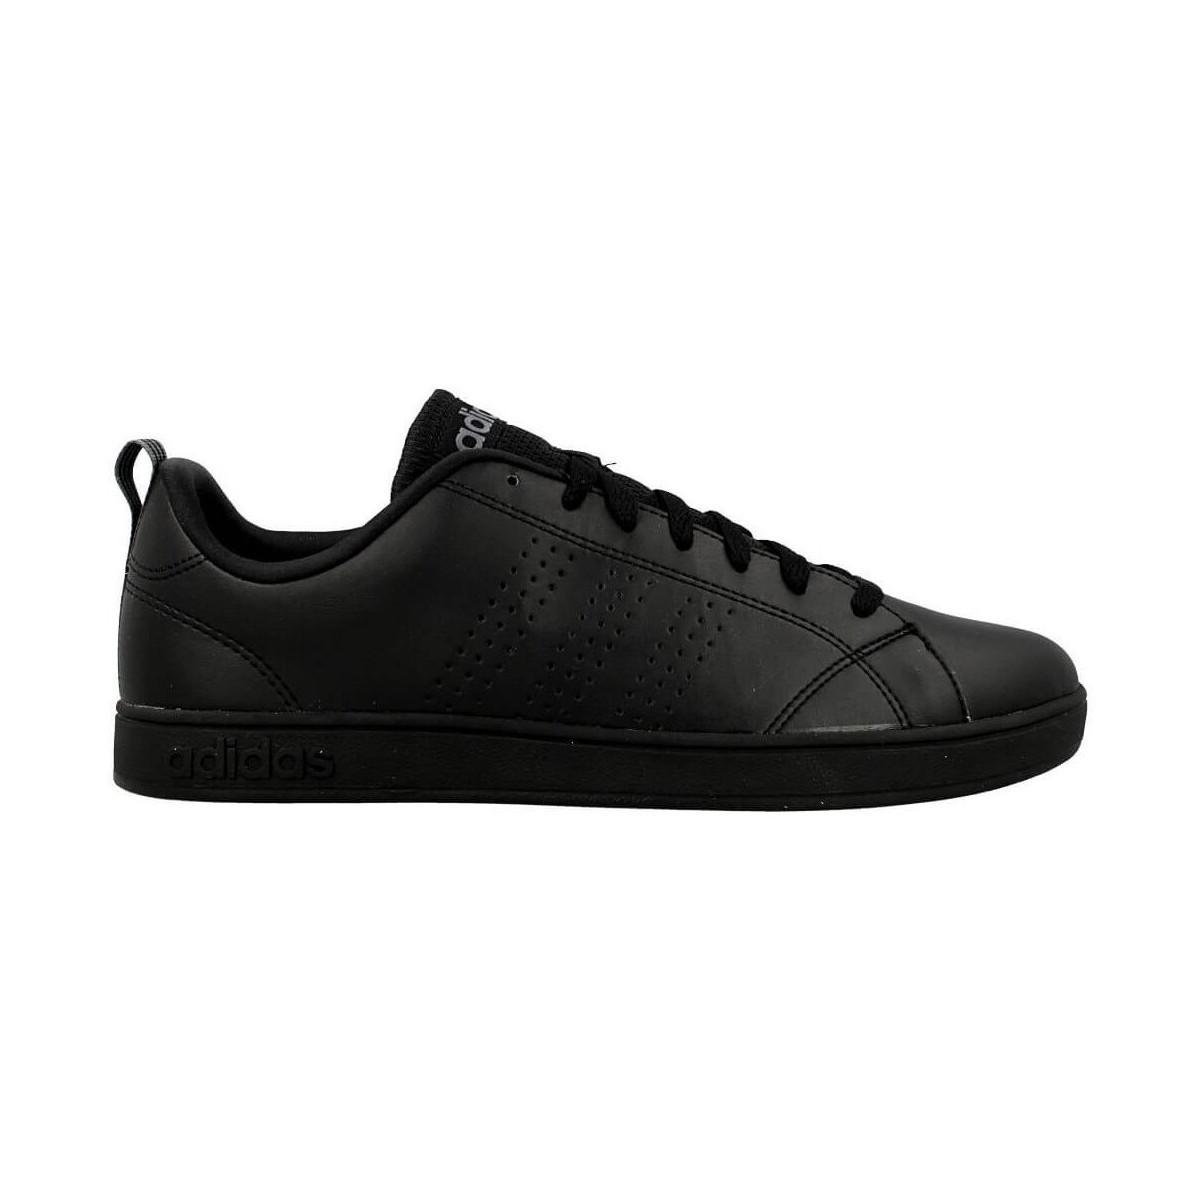 adidas Advantage Clean Vs Men's Shoes (trainers) In Black for Men - Save 12%